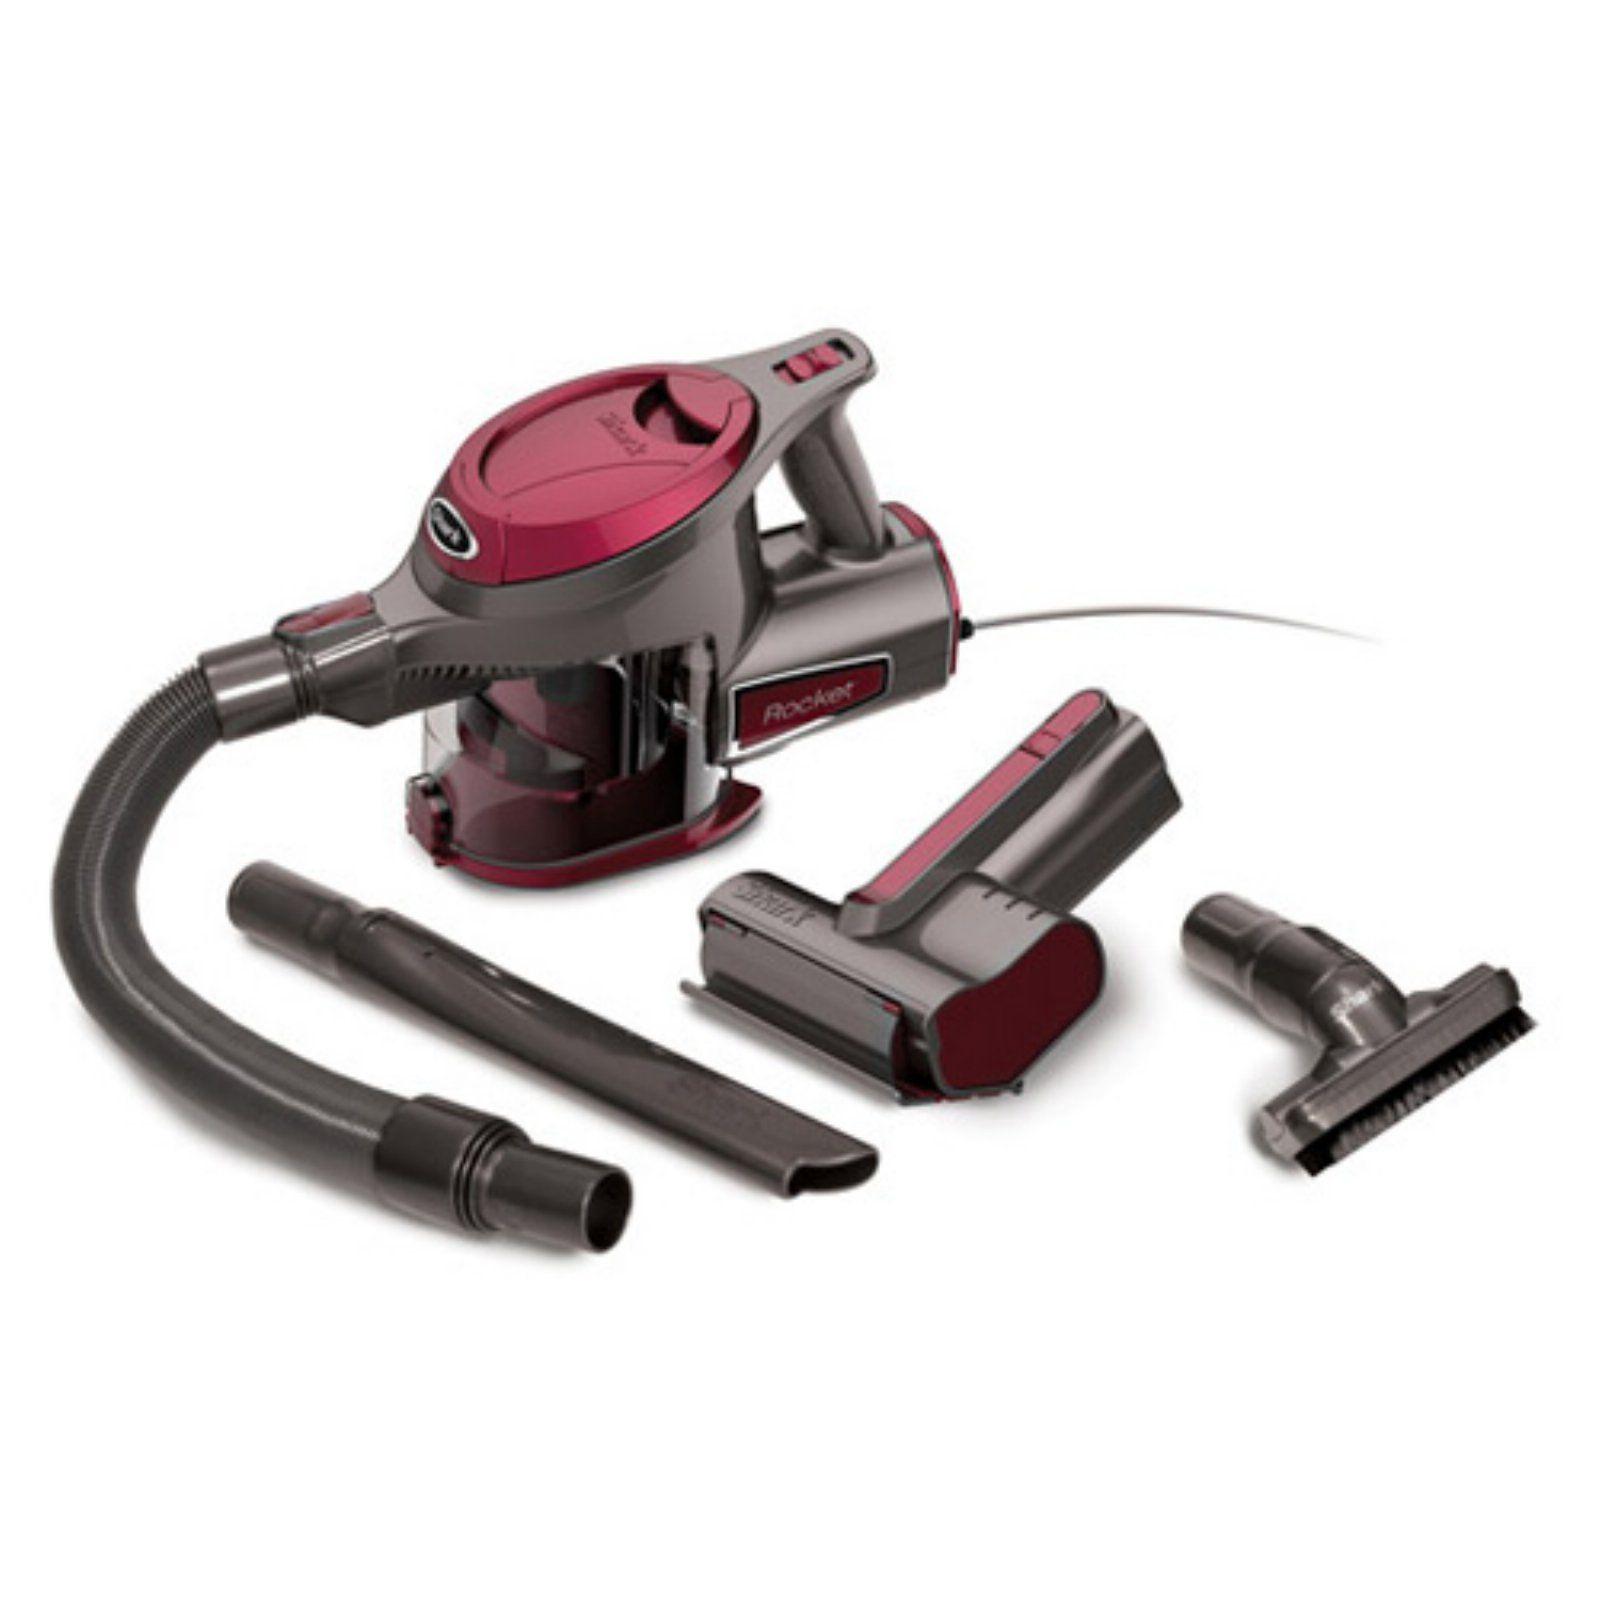 Shark Hv292 Rocket Corded Handheld Vacuum In 2019